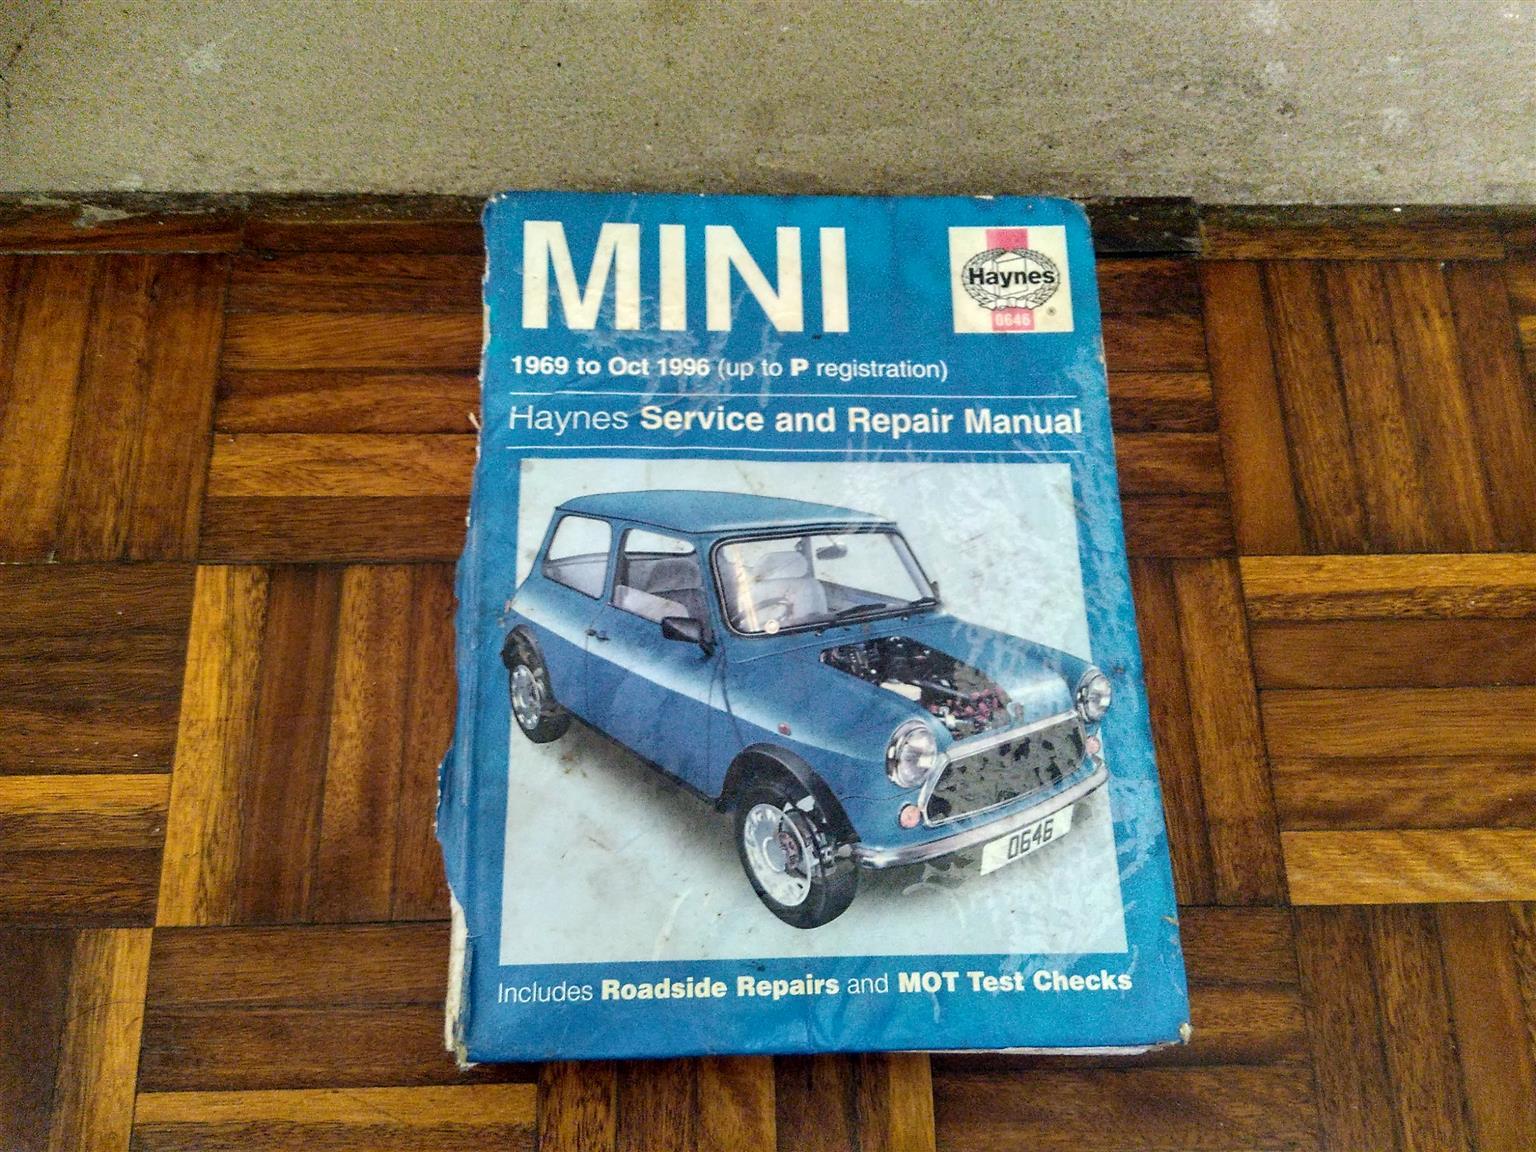 Mini Haynes service manual